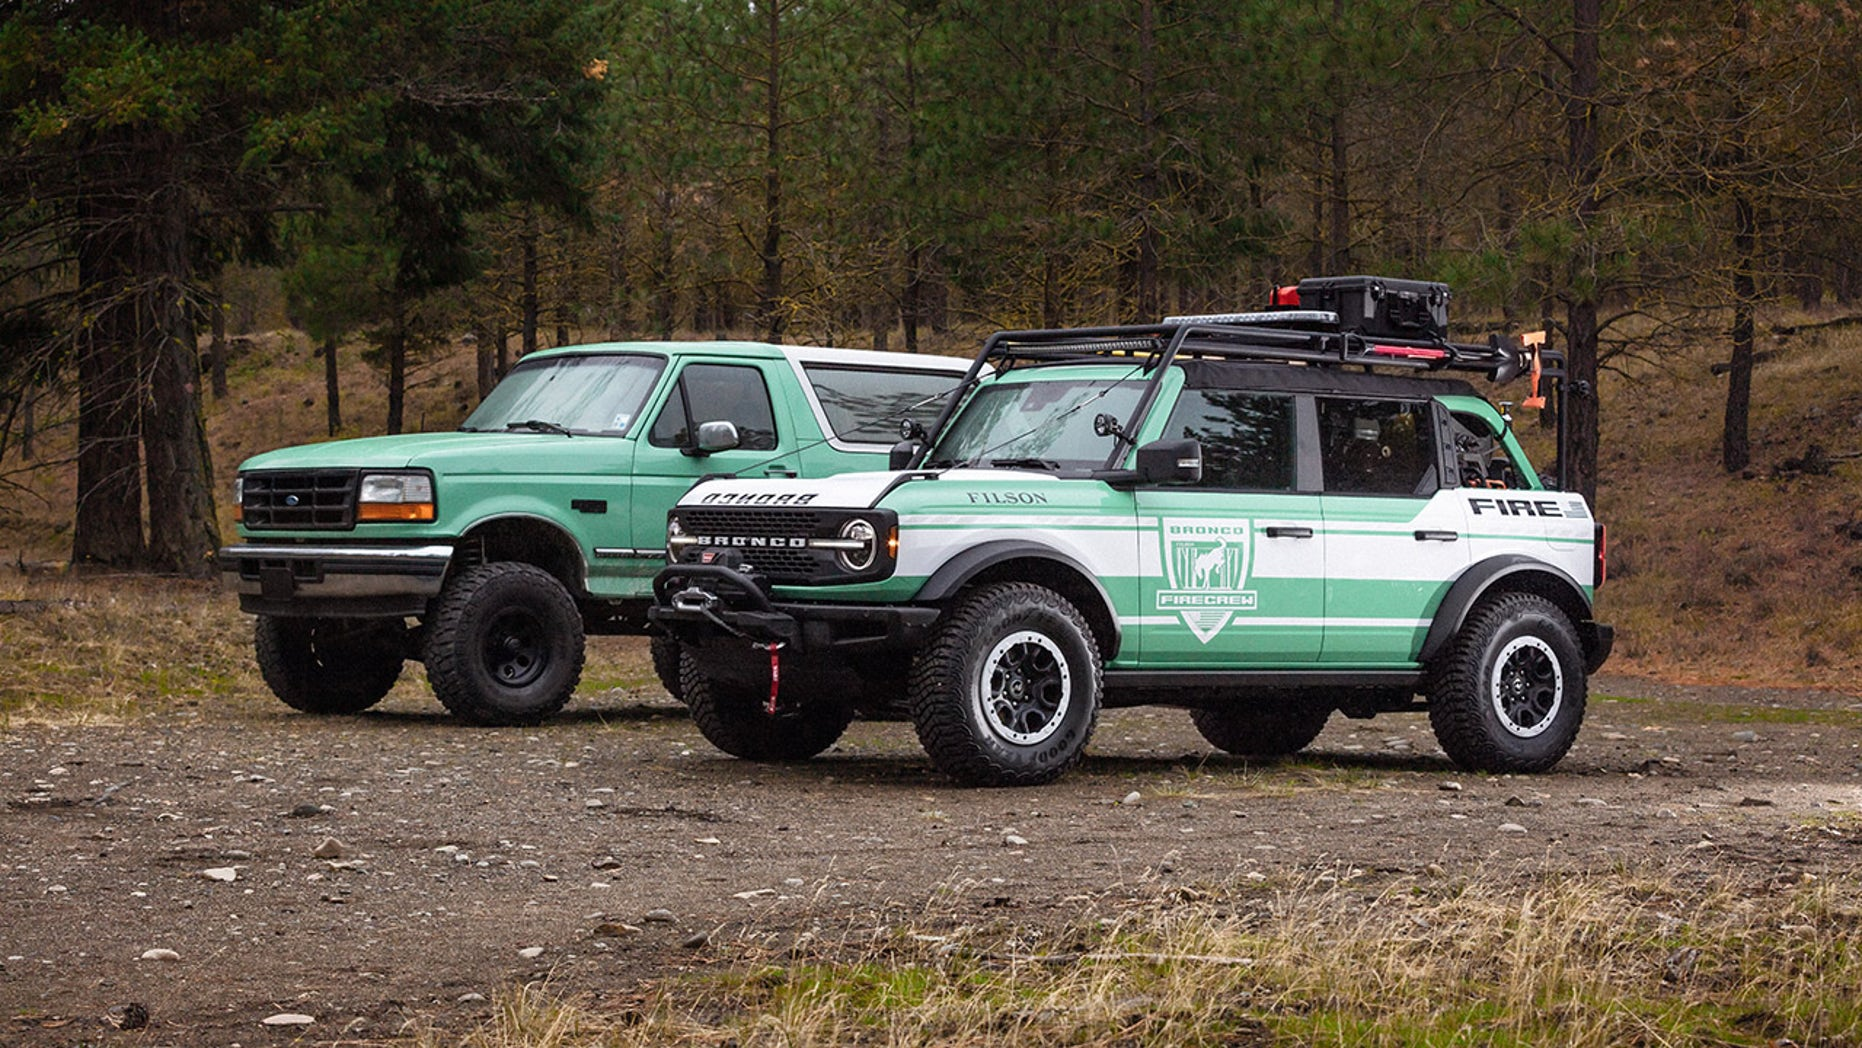 2 custom Ford Bronco firetrucks